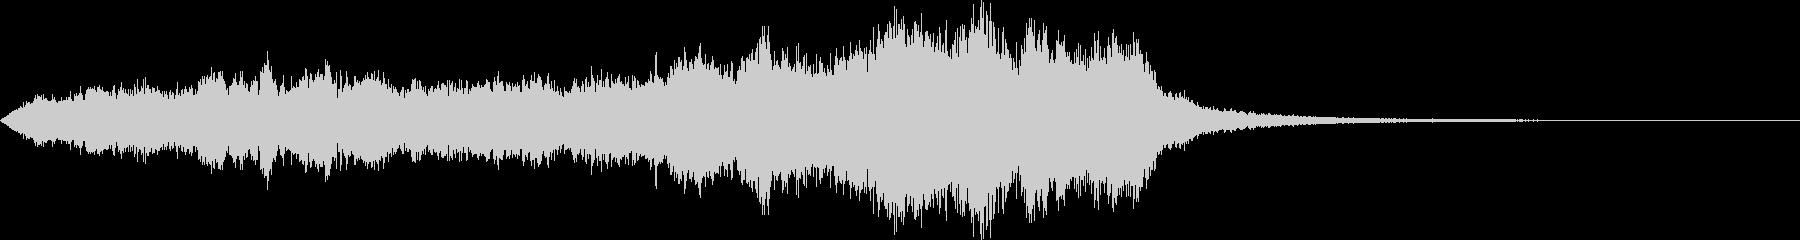 CINEMATIC RISER_25の未再生の波形